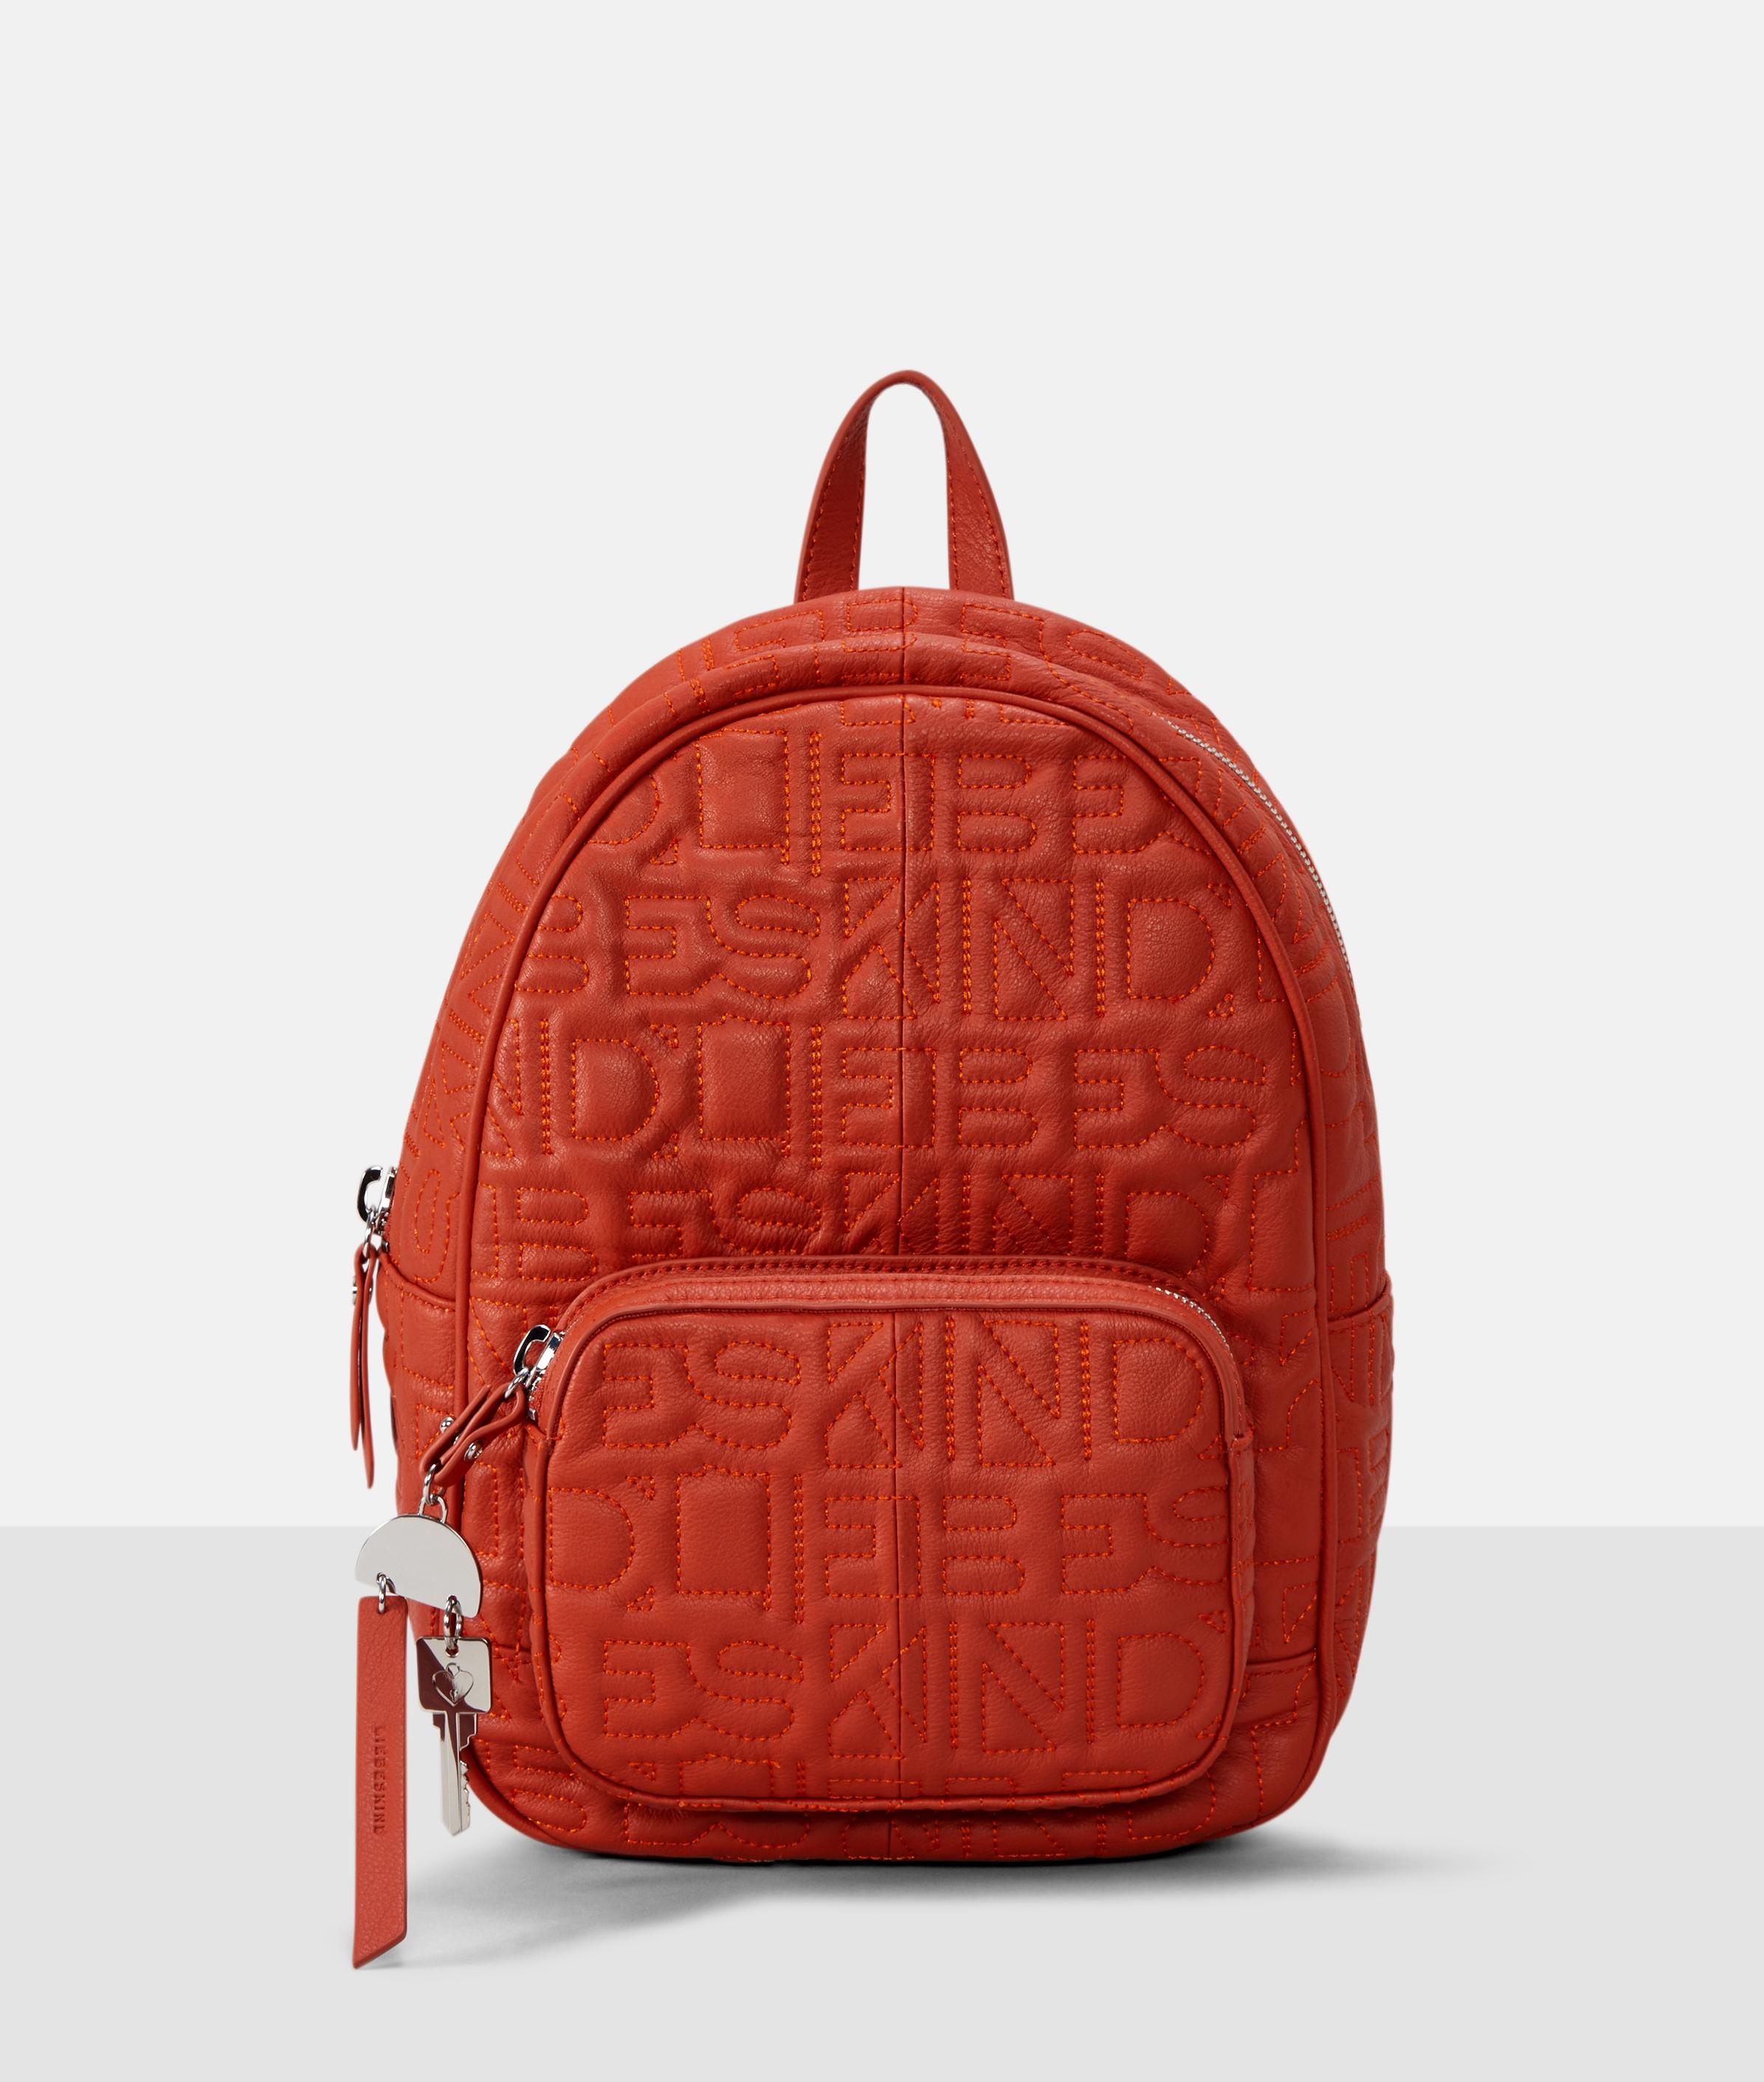 Berlin Tasche Urban Monogram Backpack M, Orange